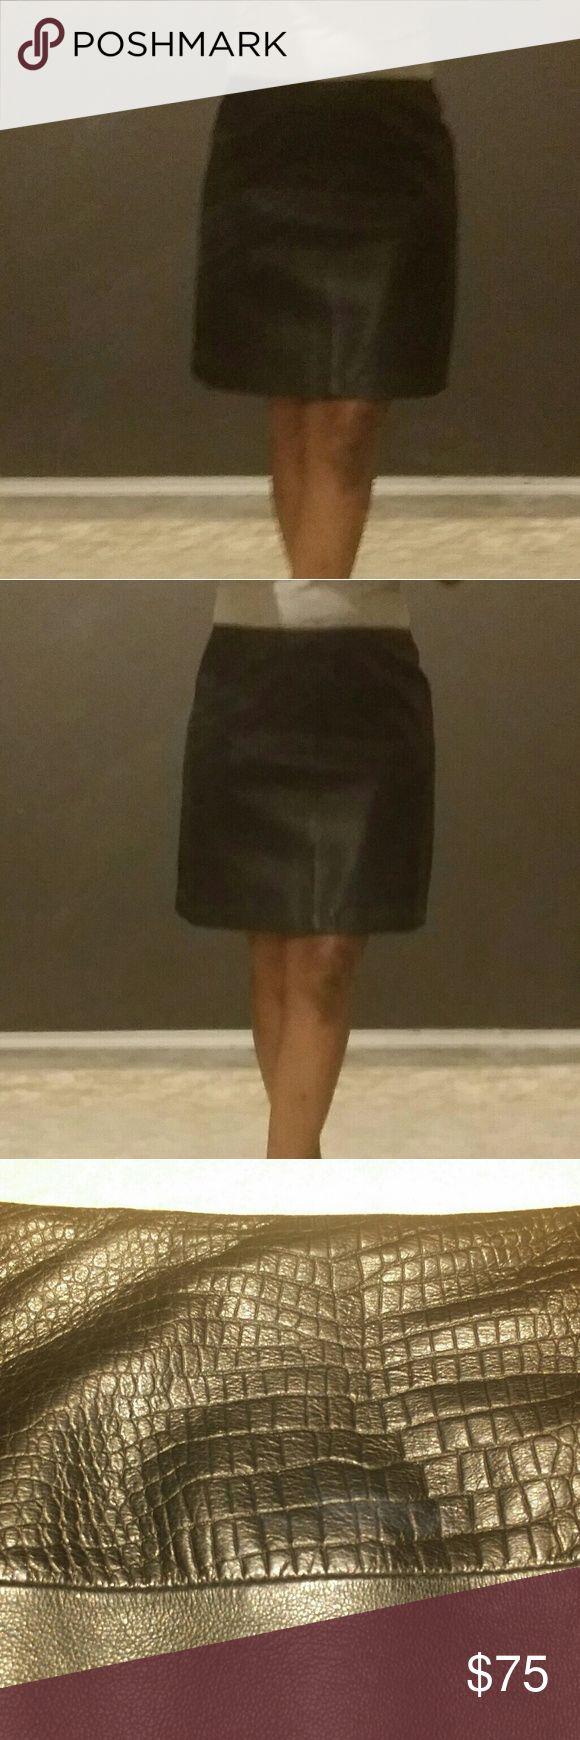 Tahari Black Leather mini skirt Super cute soft leather mini shirt by Tahari. It has crocodile print at the top. Prefect for an elegant evening out. Tahari Skirts Mini